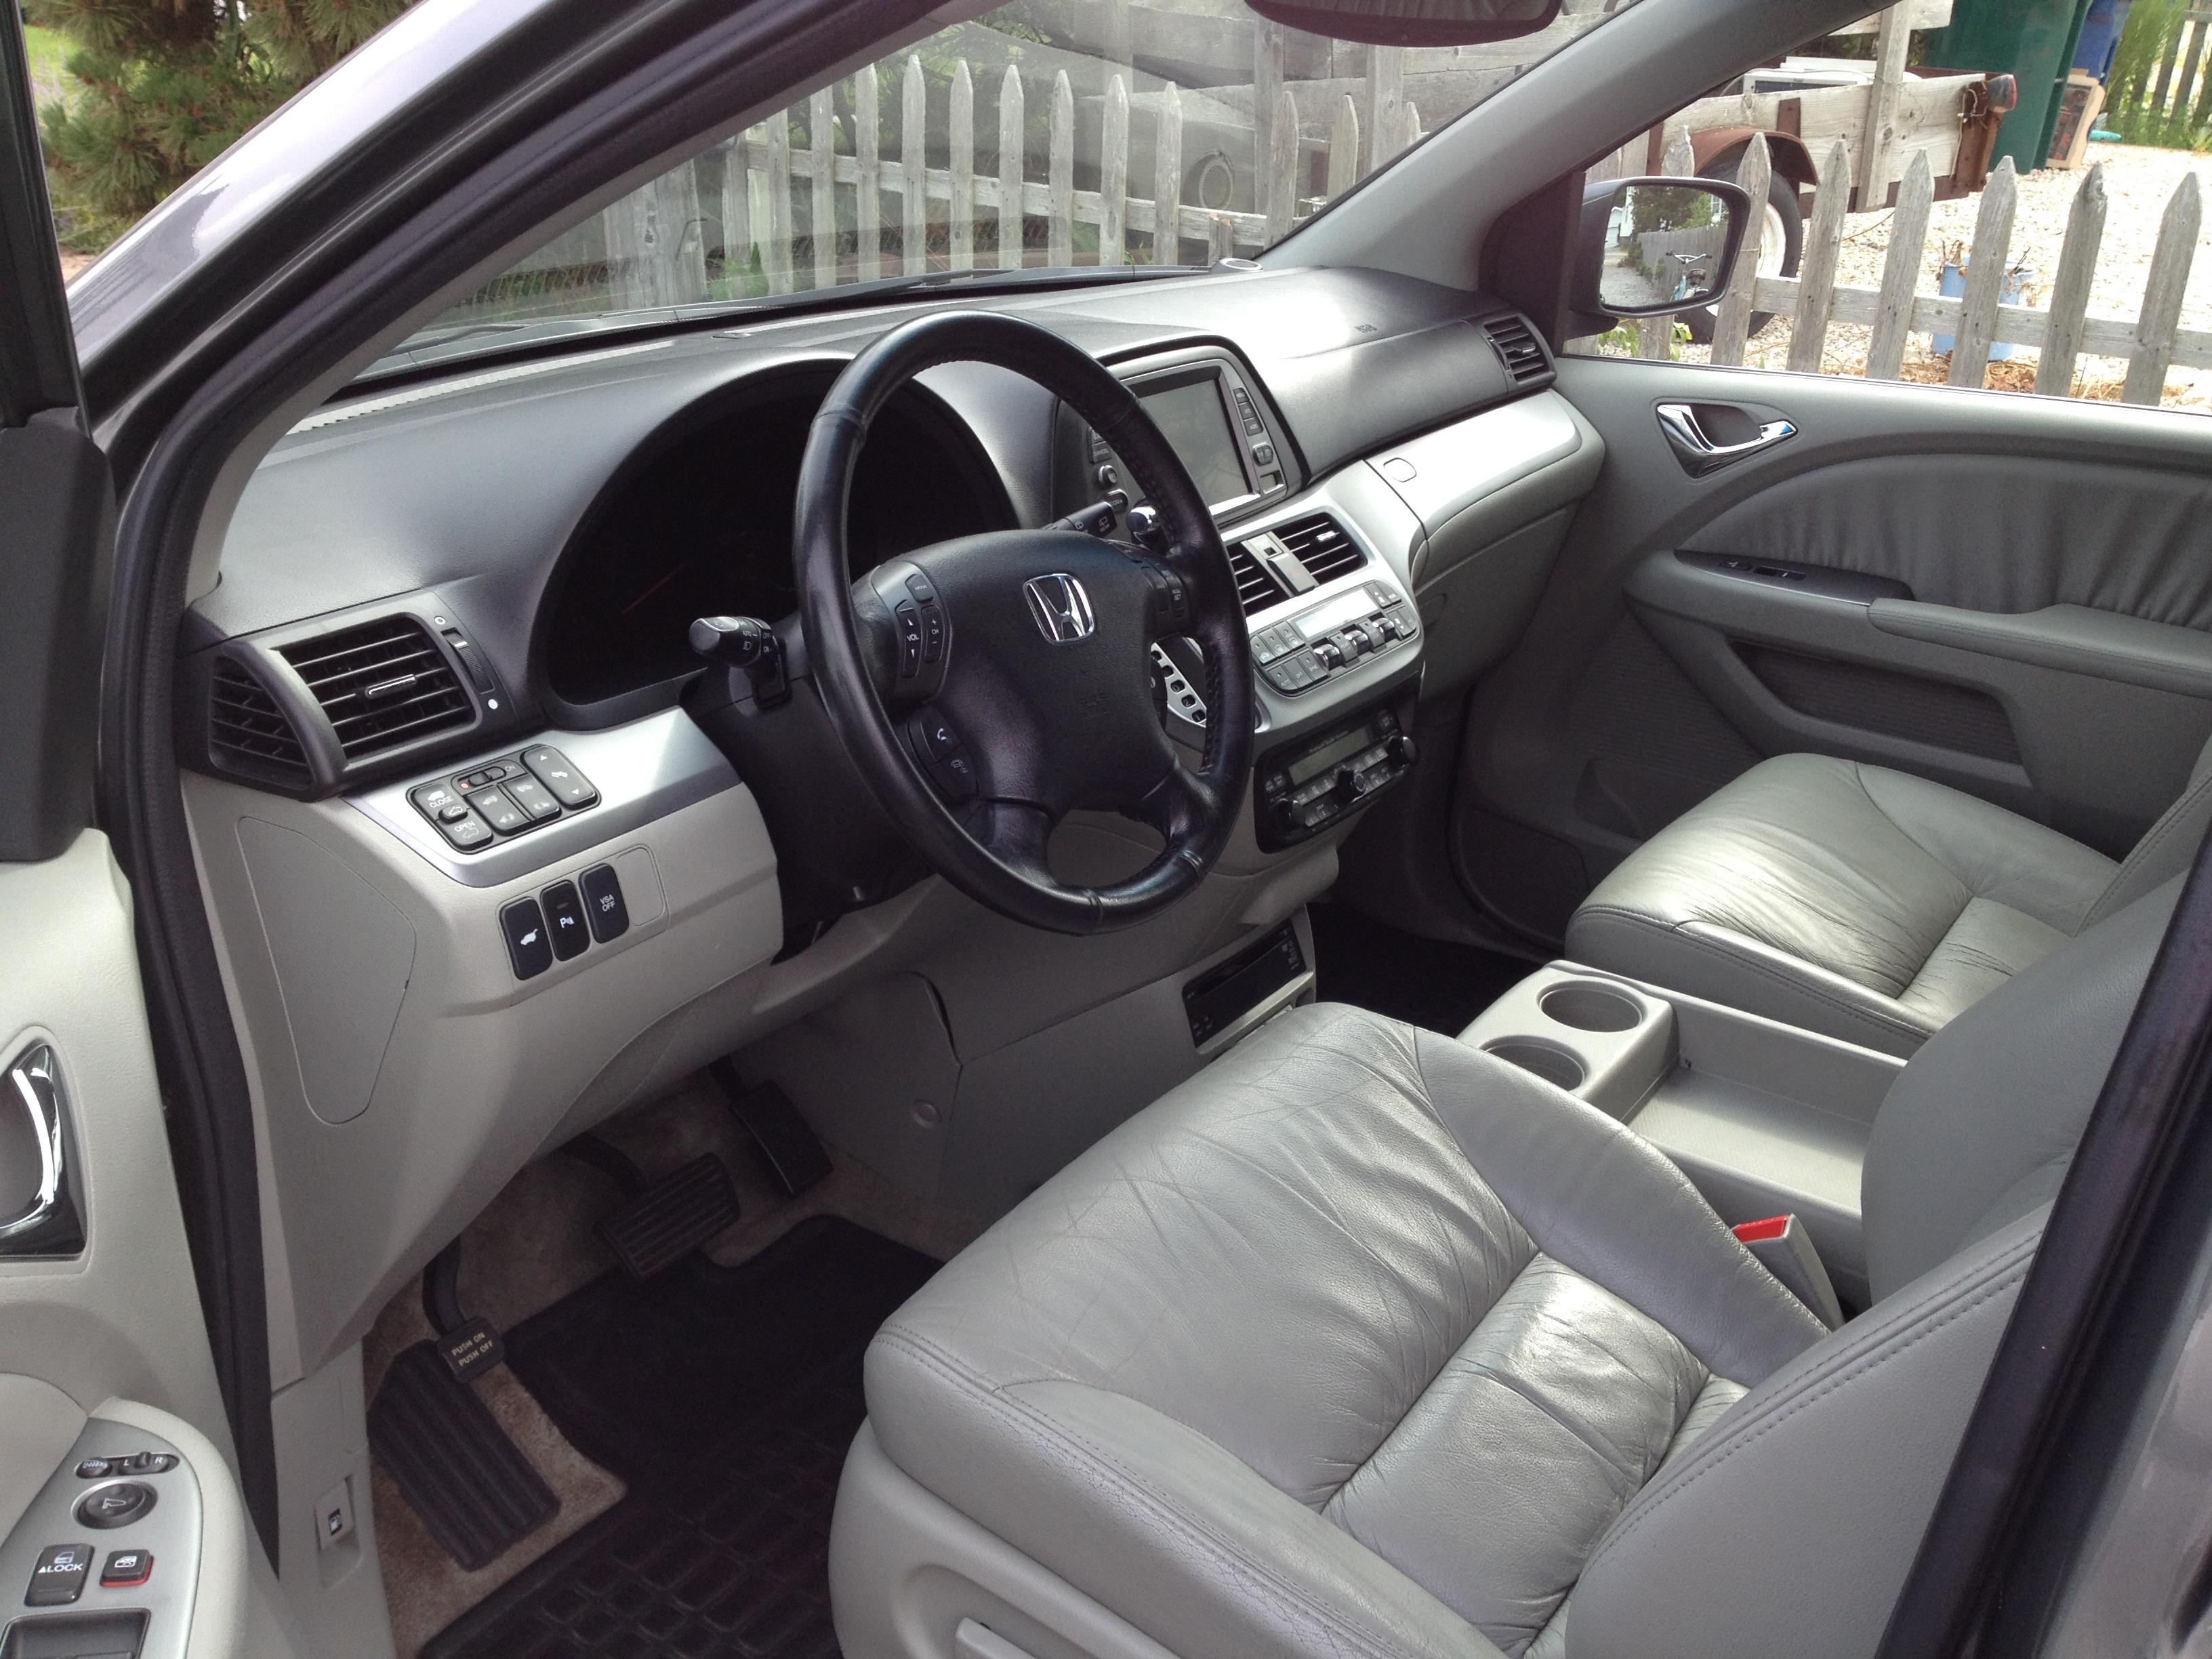 interior auto detailing ct interior car cleaning in connecticut. Black Bedroom Furniture Sets. Home Design Ideas